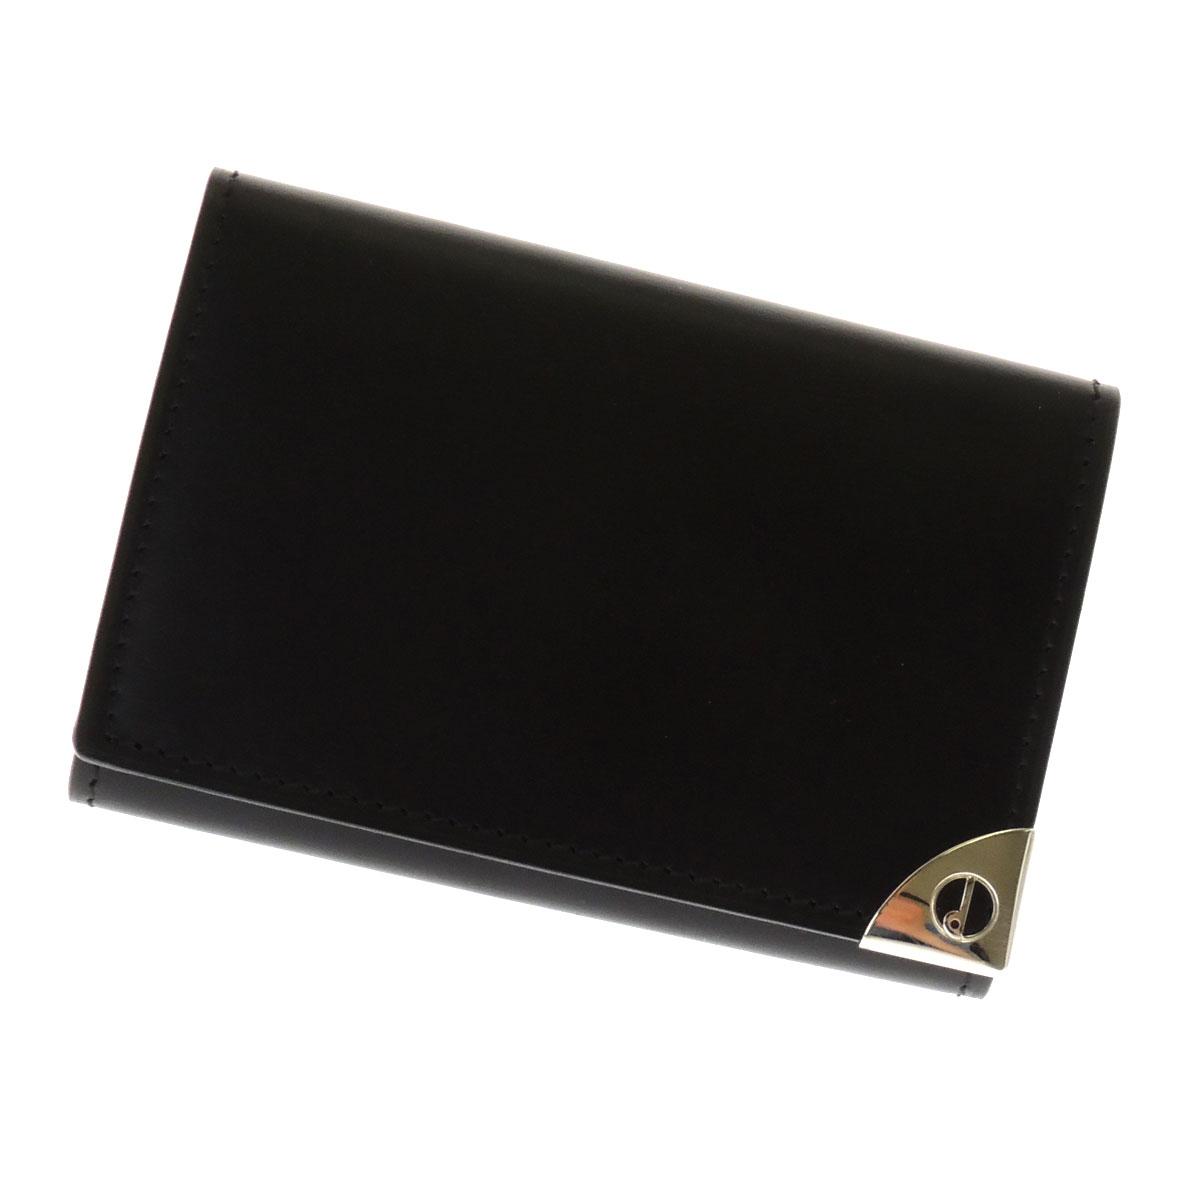 Dunhill logo key case leather men's